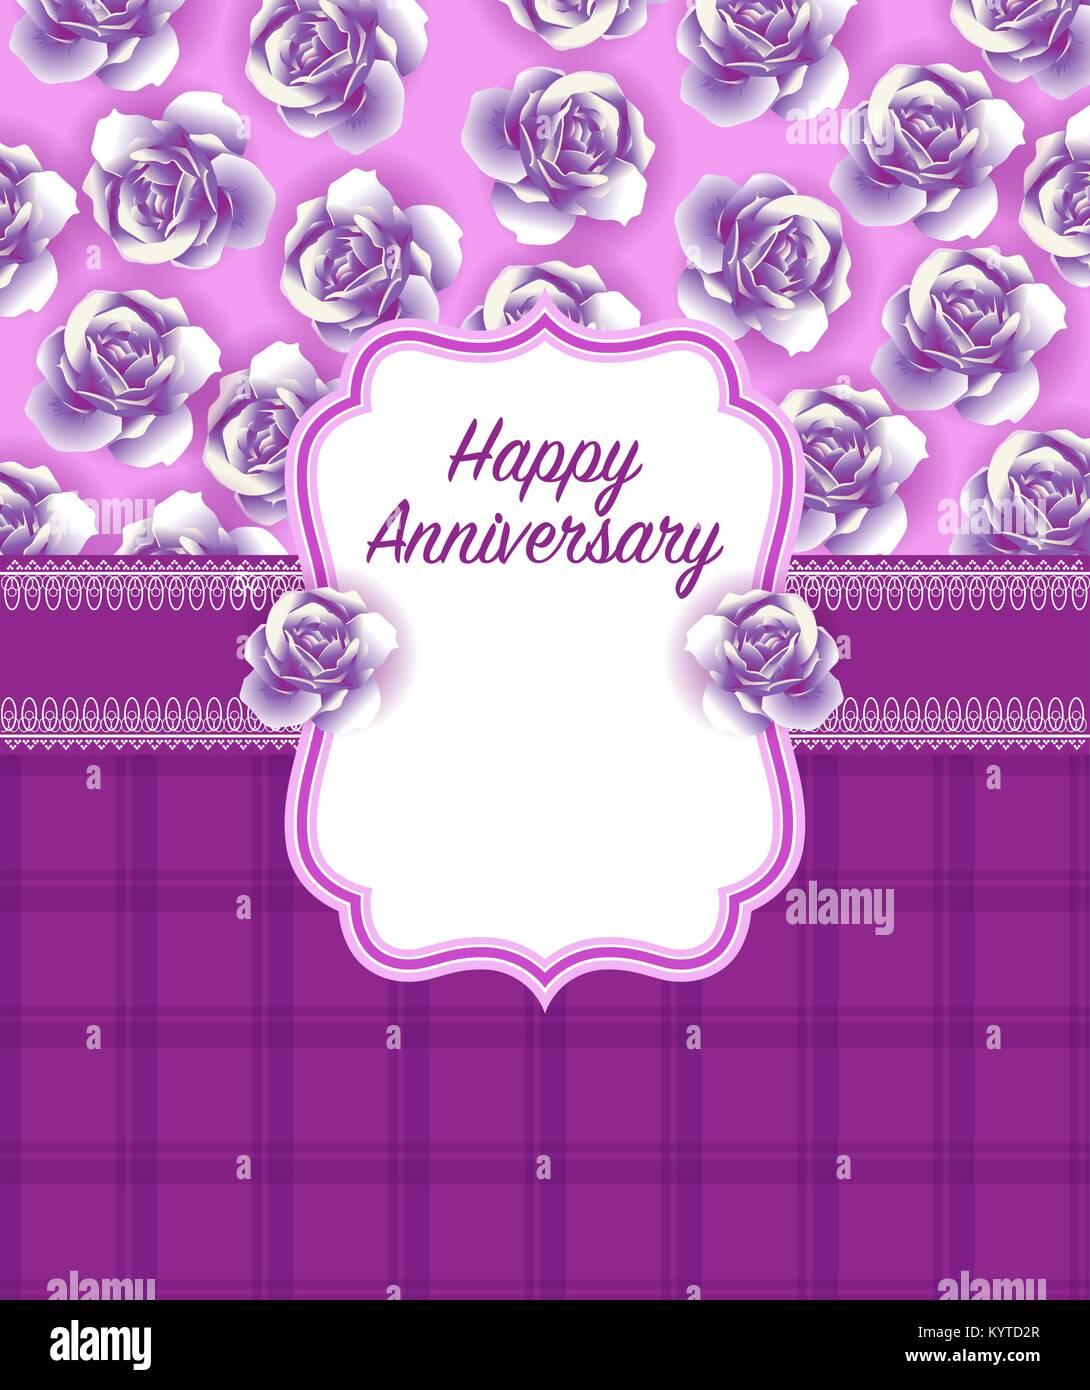 Happy Anniversary Greeting Card Design Stock Vector Art